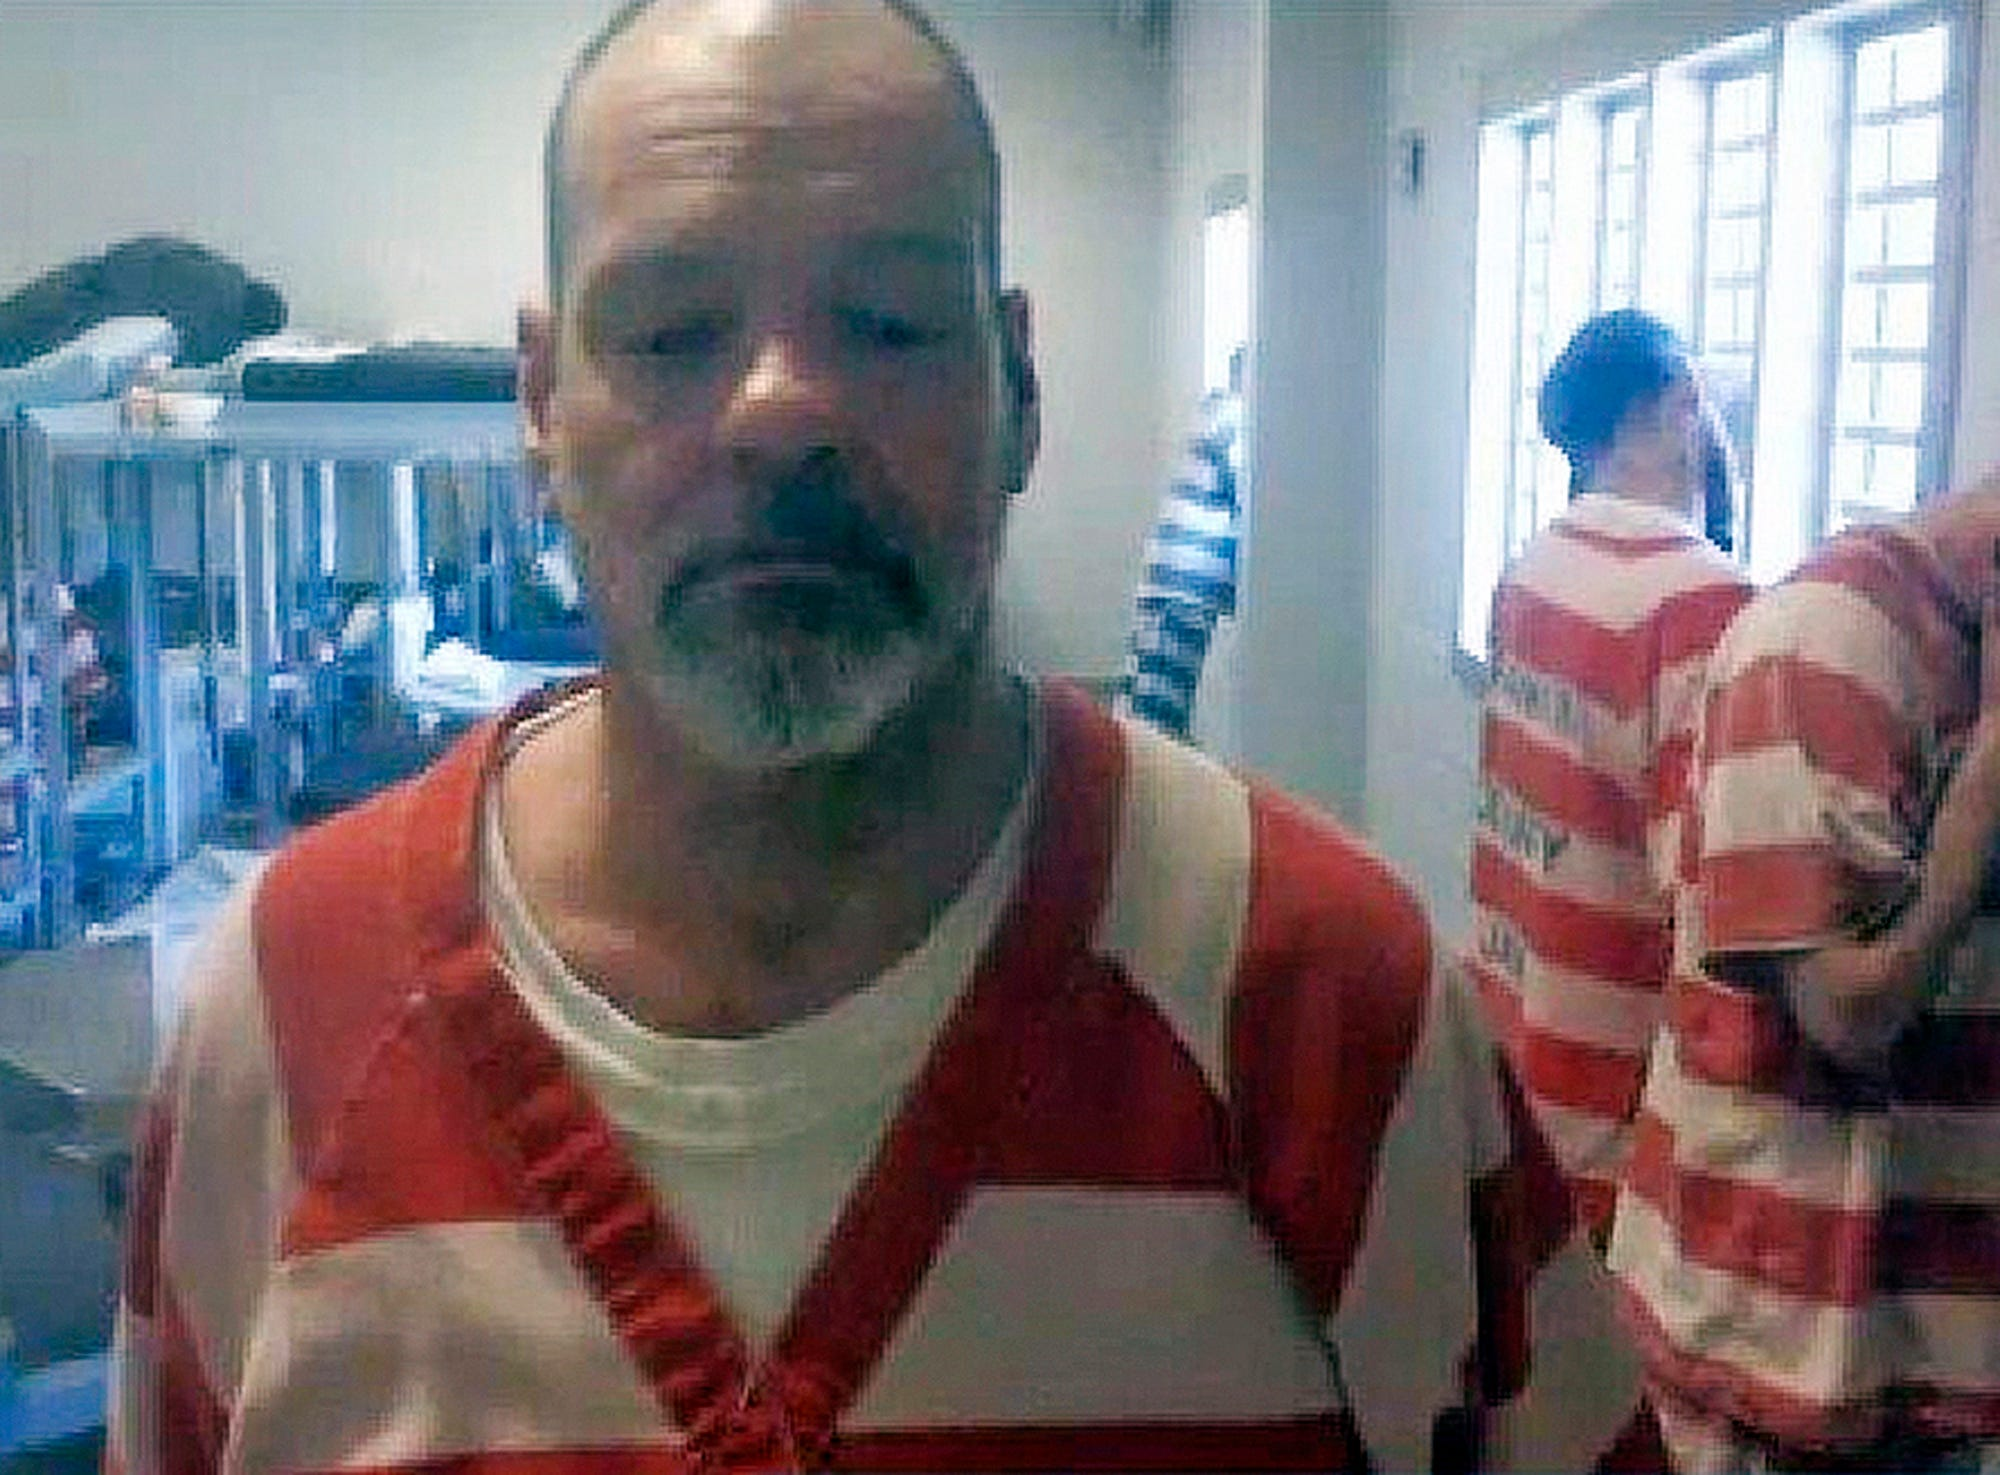 Mississippi defendants spend months in jail awaiting trial   Clarion Ledger